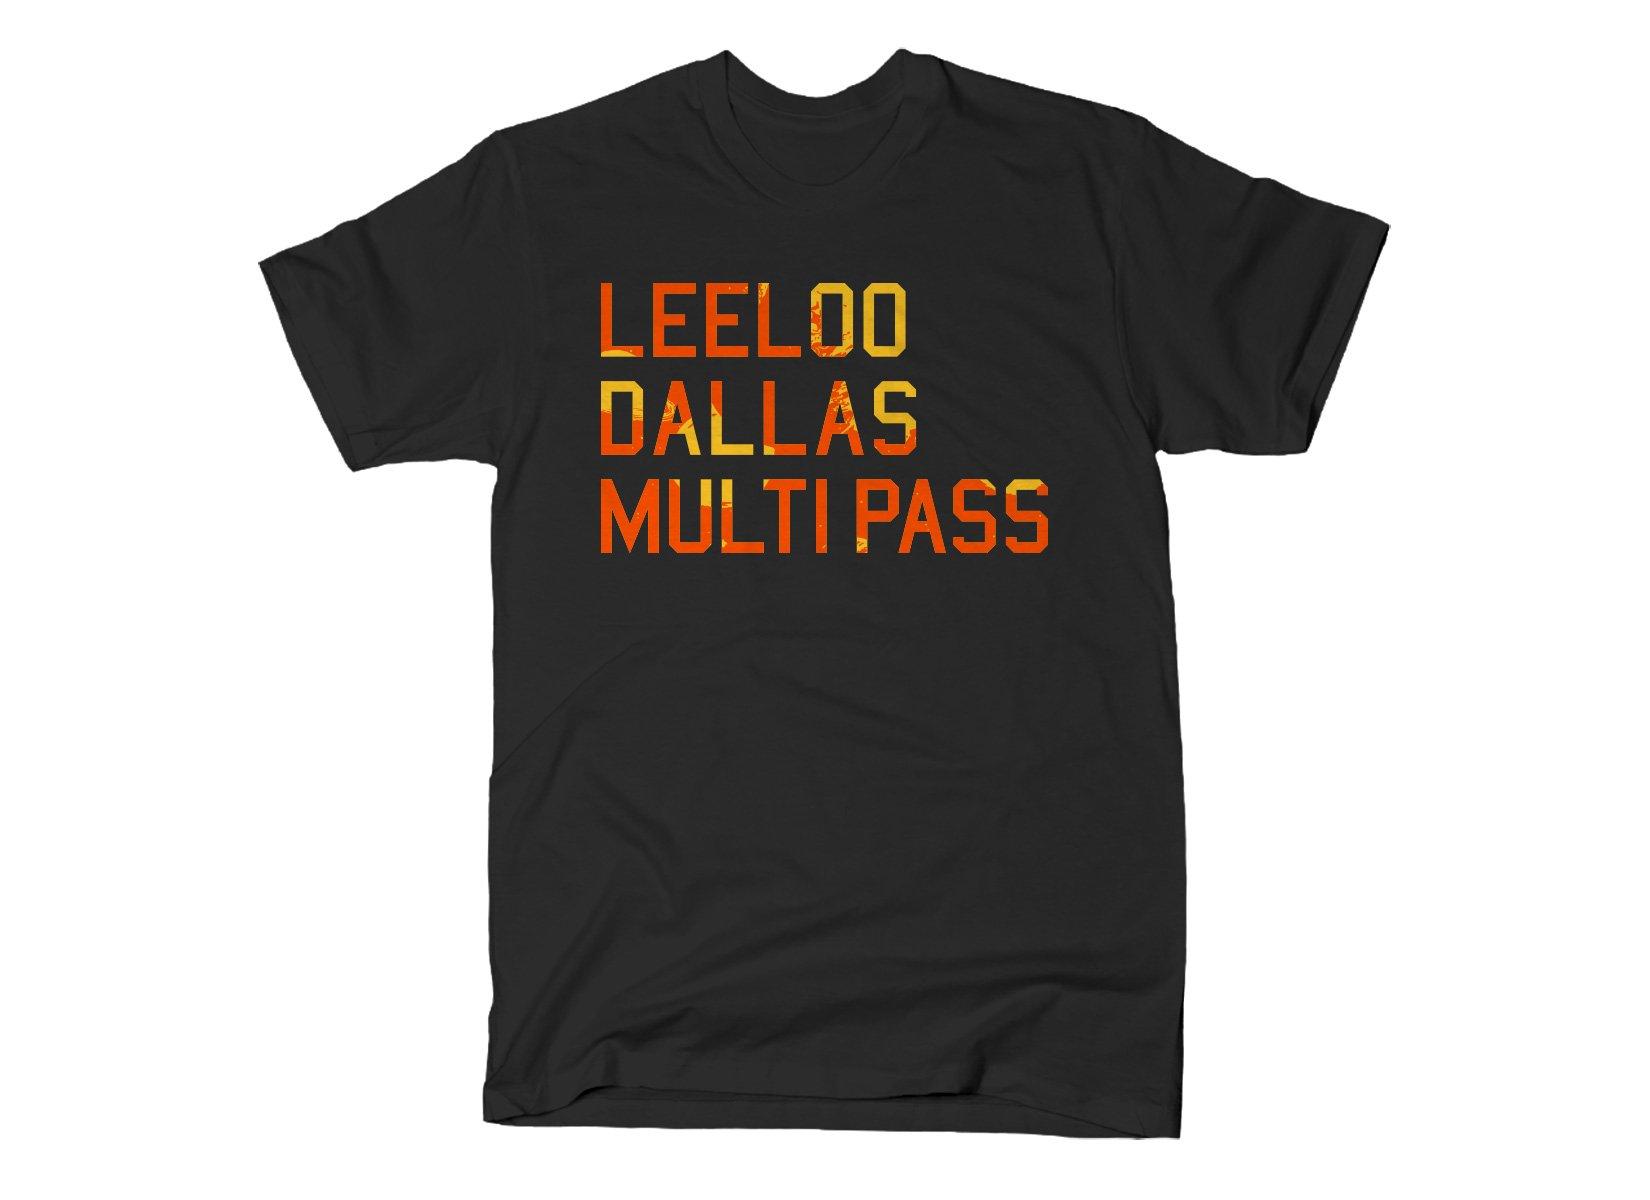 SnorgTees: Leeloo Dallas Multipass